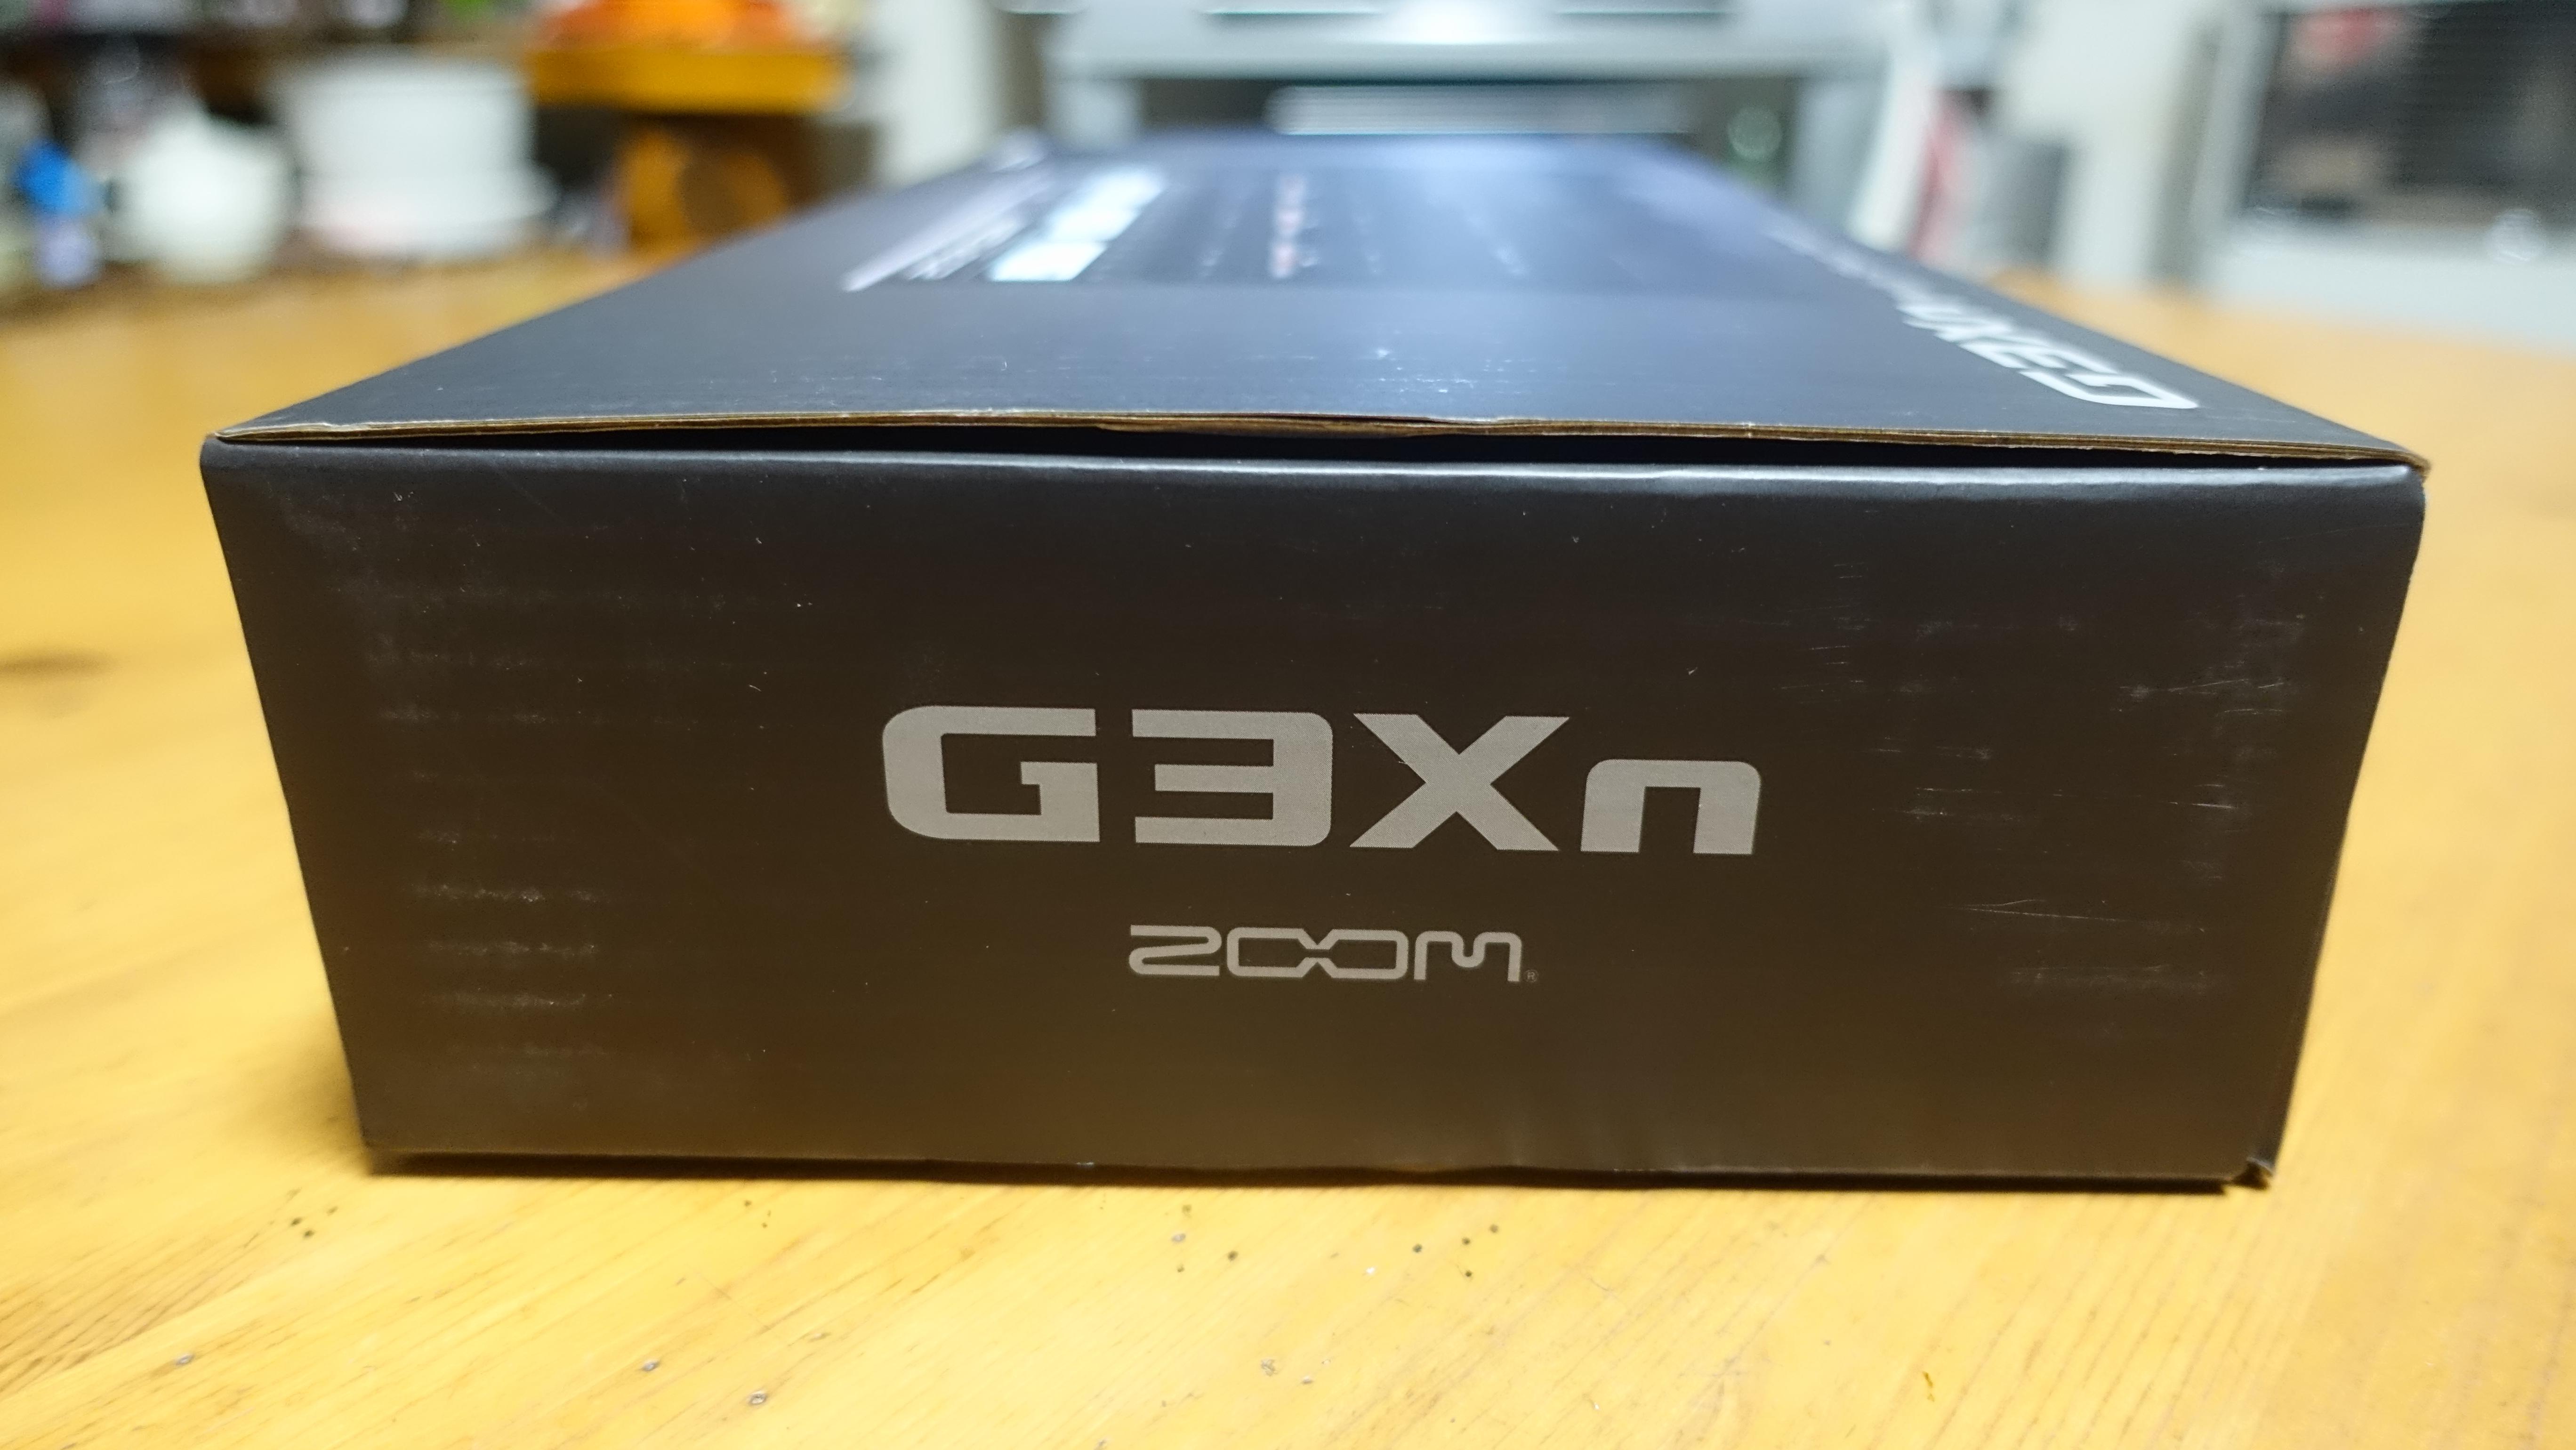 zoom-g3xn_05